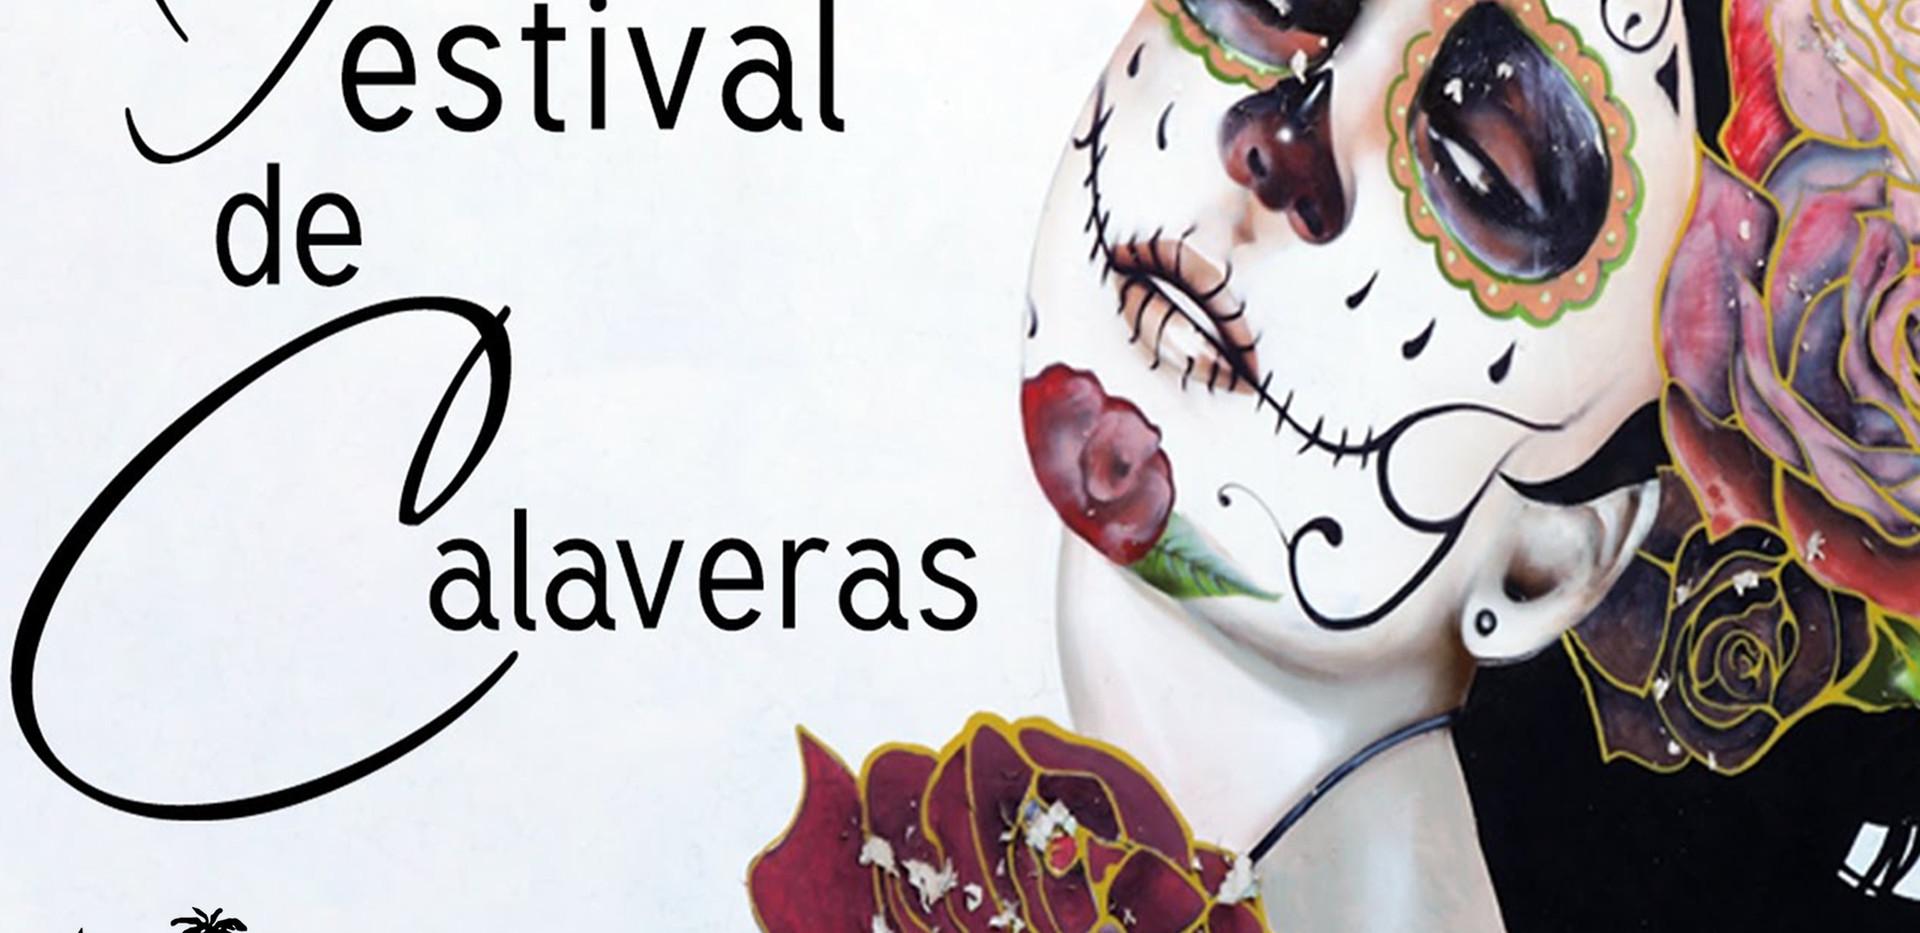 Festival de Calaveras 1.jpg